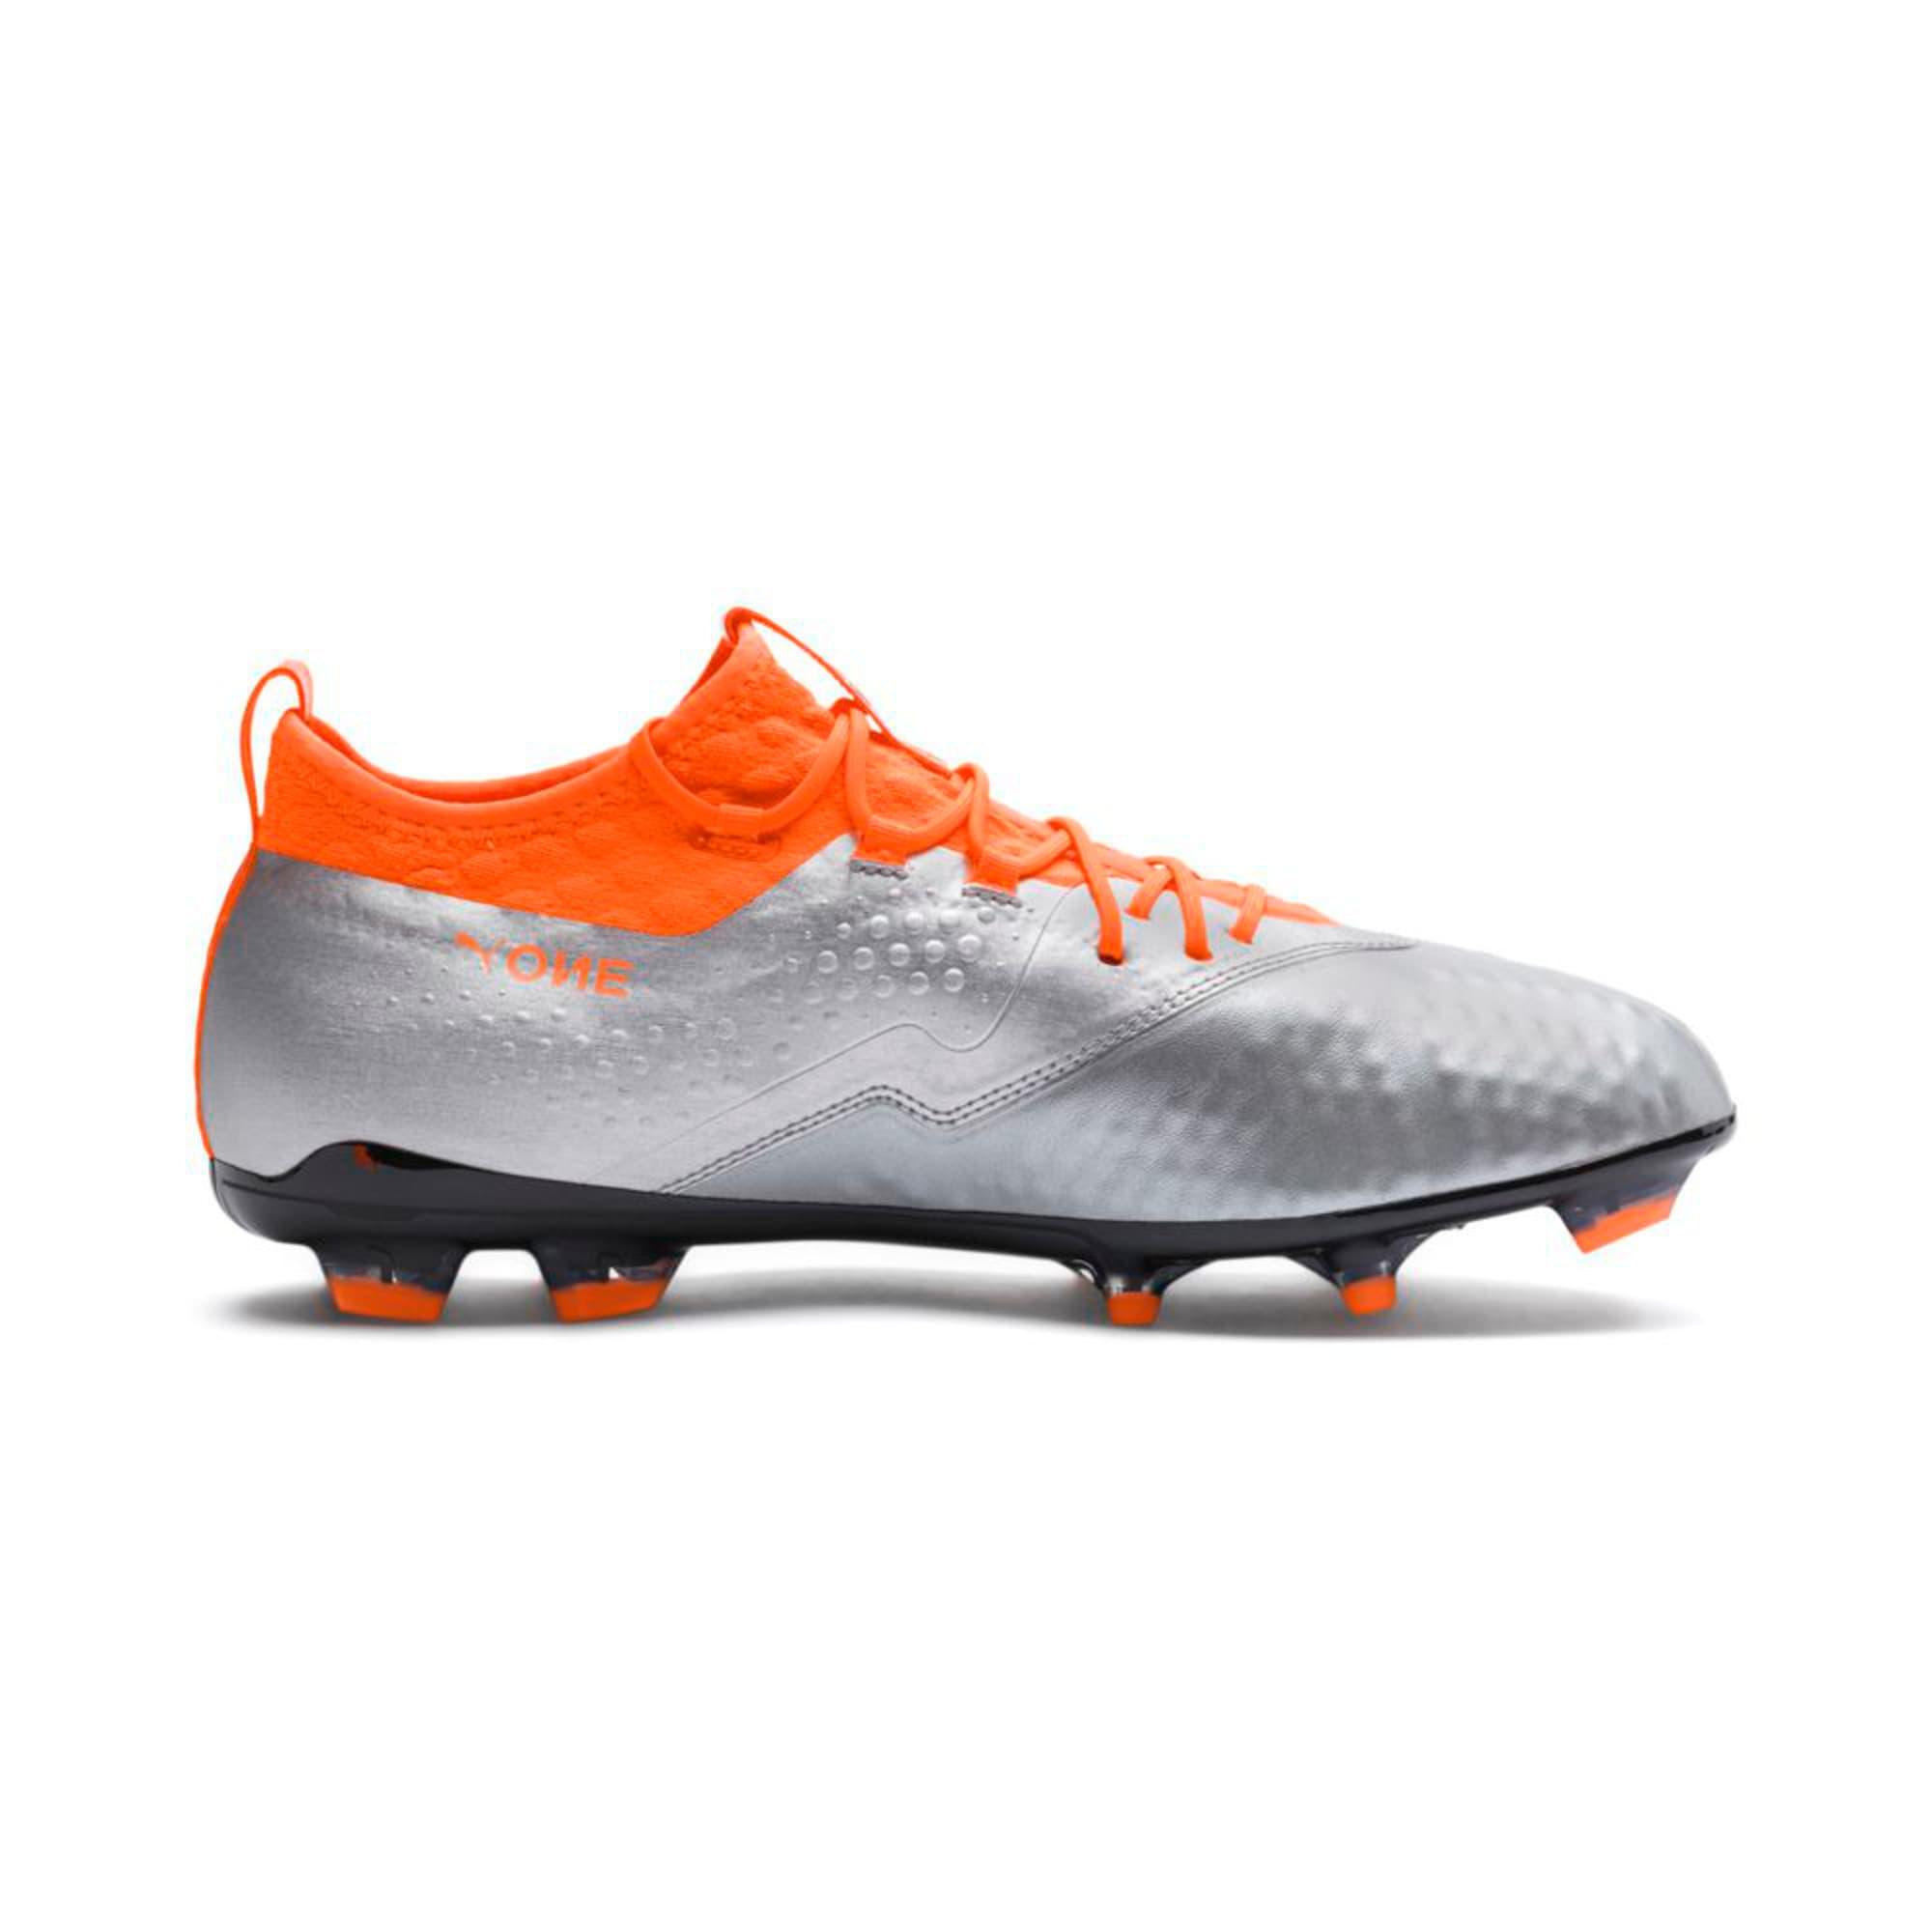 Thumbnail 5 of PUMA ONE 2 Leather FG  Football Boots, Silver-Orange-Black, medium-IND